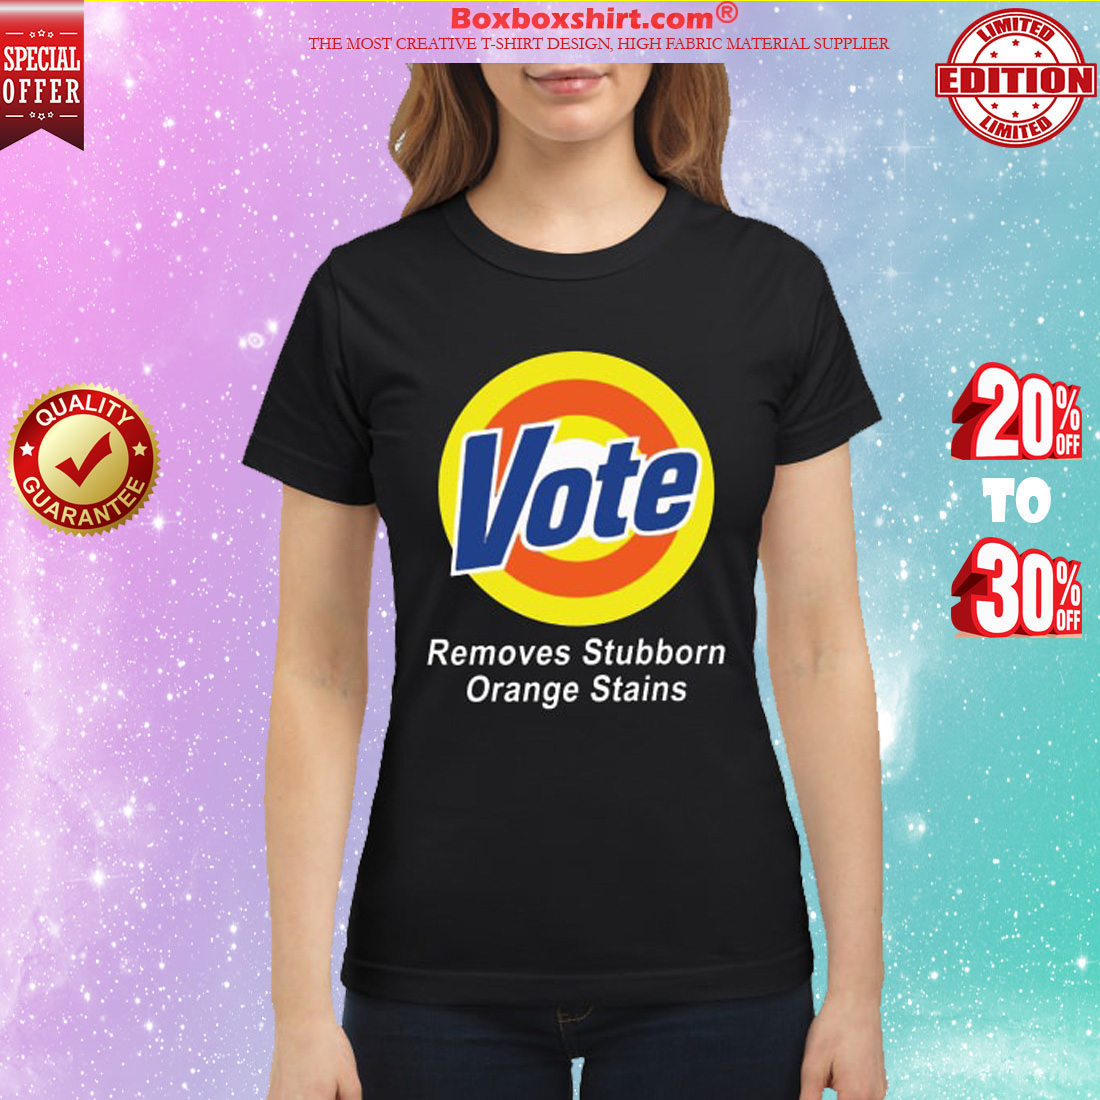 Vote remove stubborn orange stains classic shirt